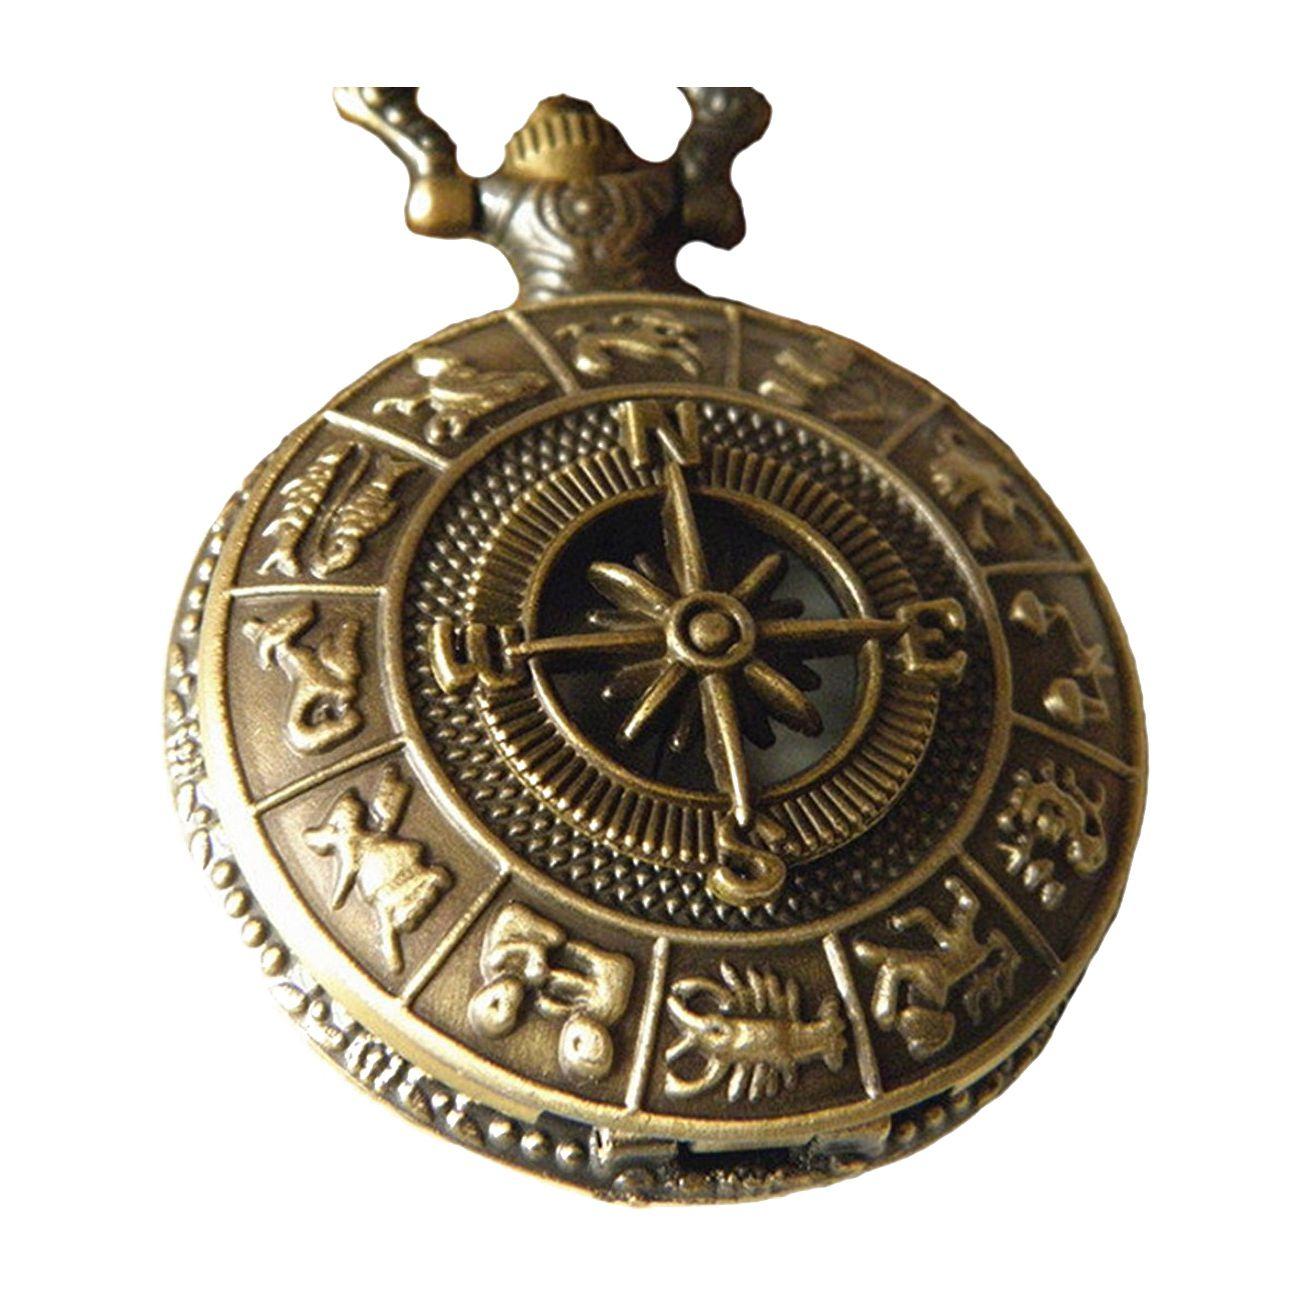 Vintage Brass Pocket Watch with Compass Necklace Twelve Constellation Navigation Necklace Pocket Watch vintage eagle pattern water resistant quartz pocket watch with chains antique brass 1 x 377